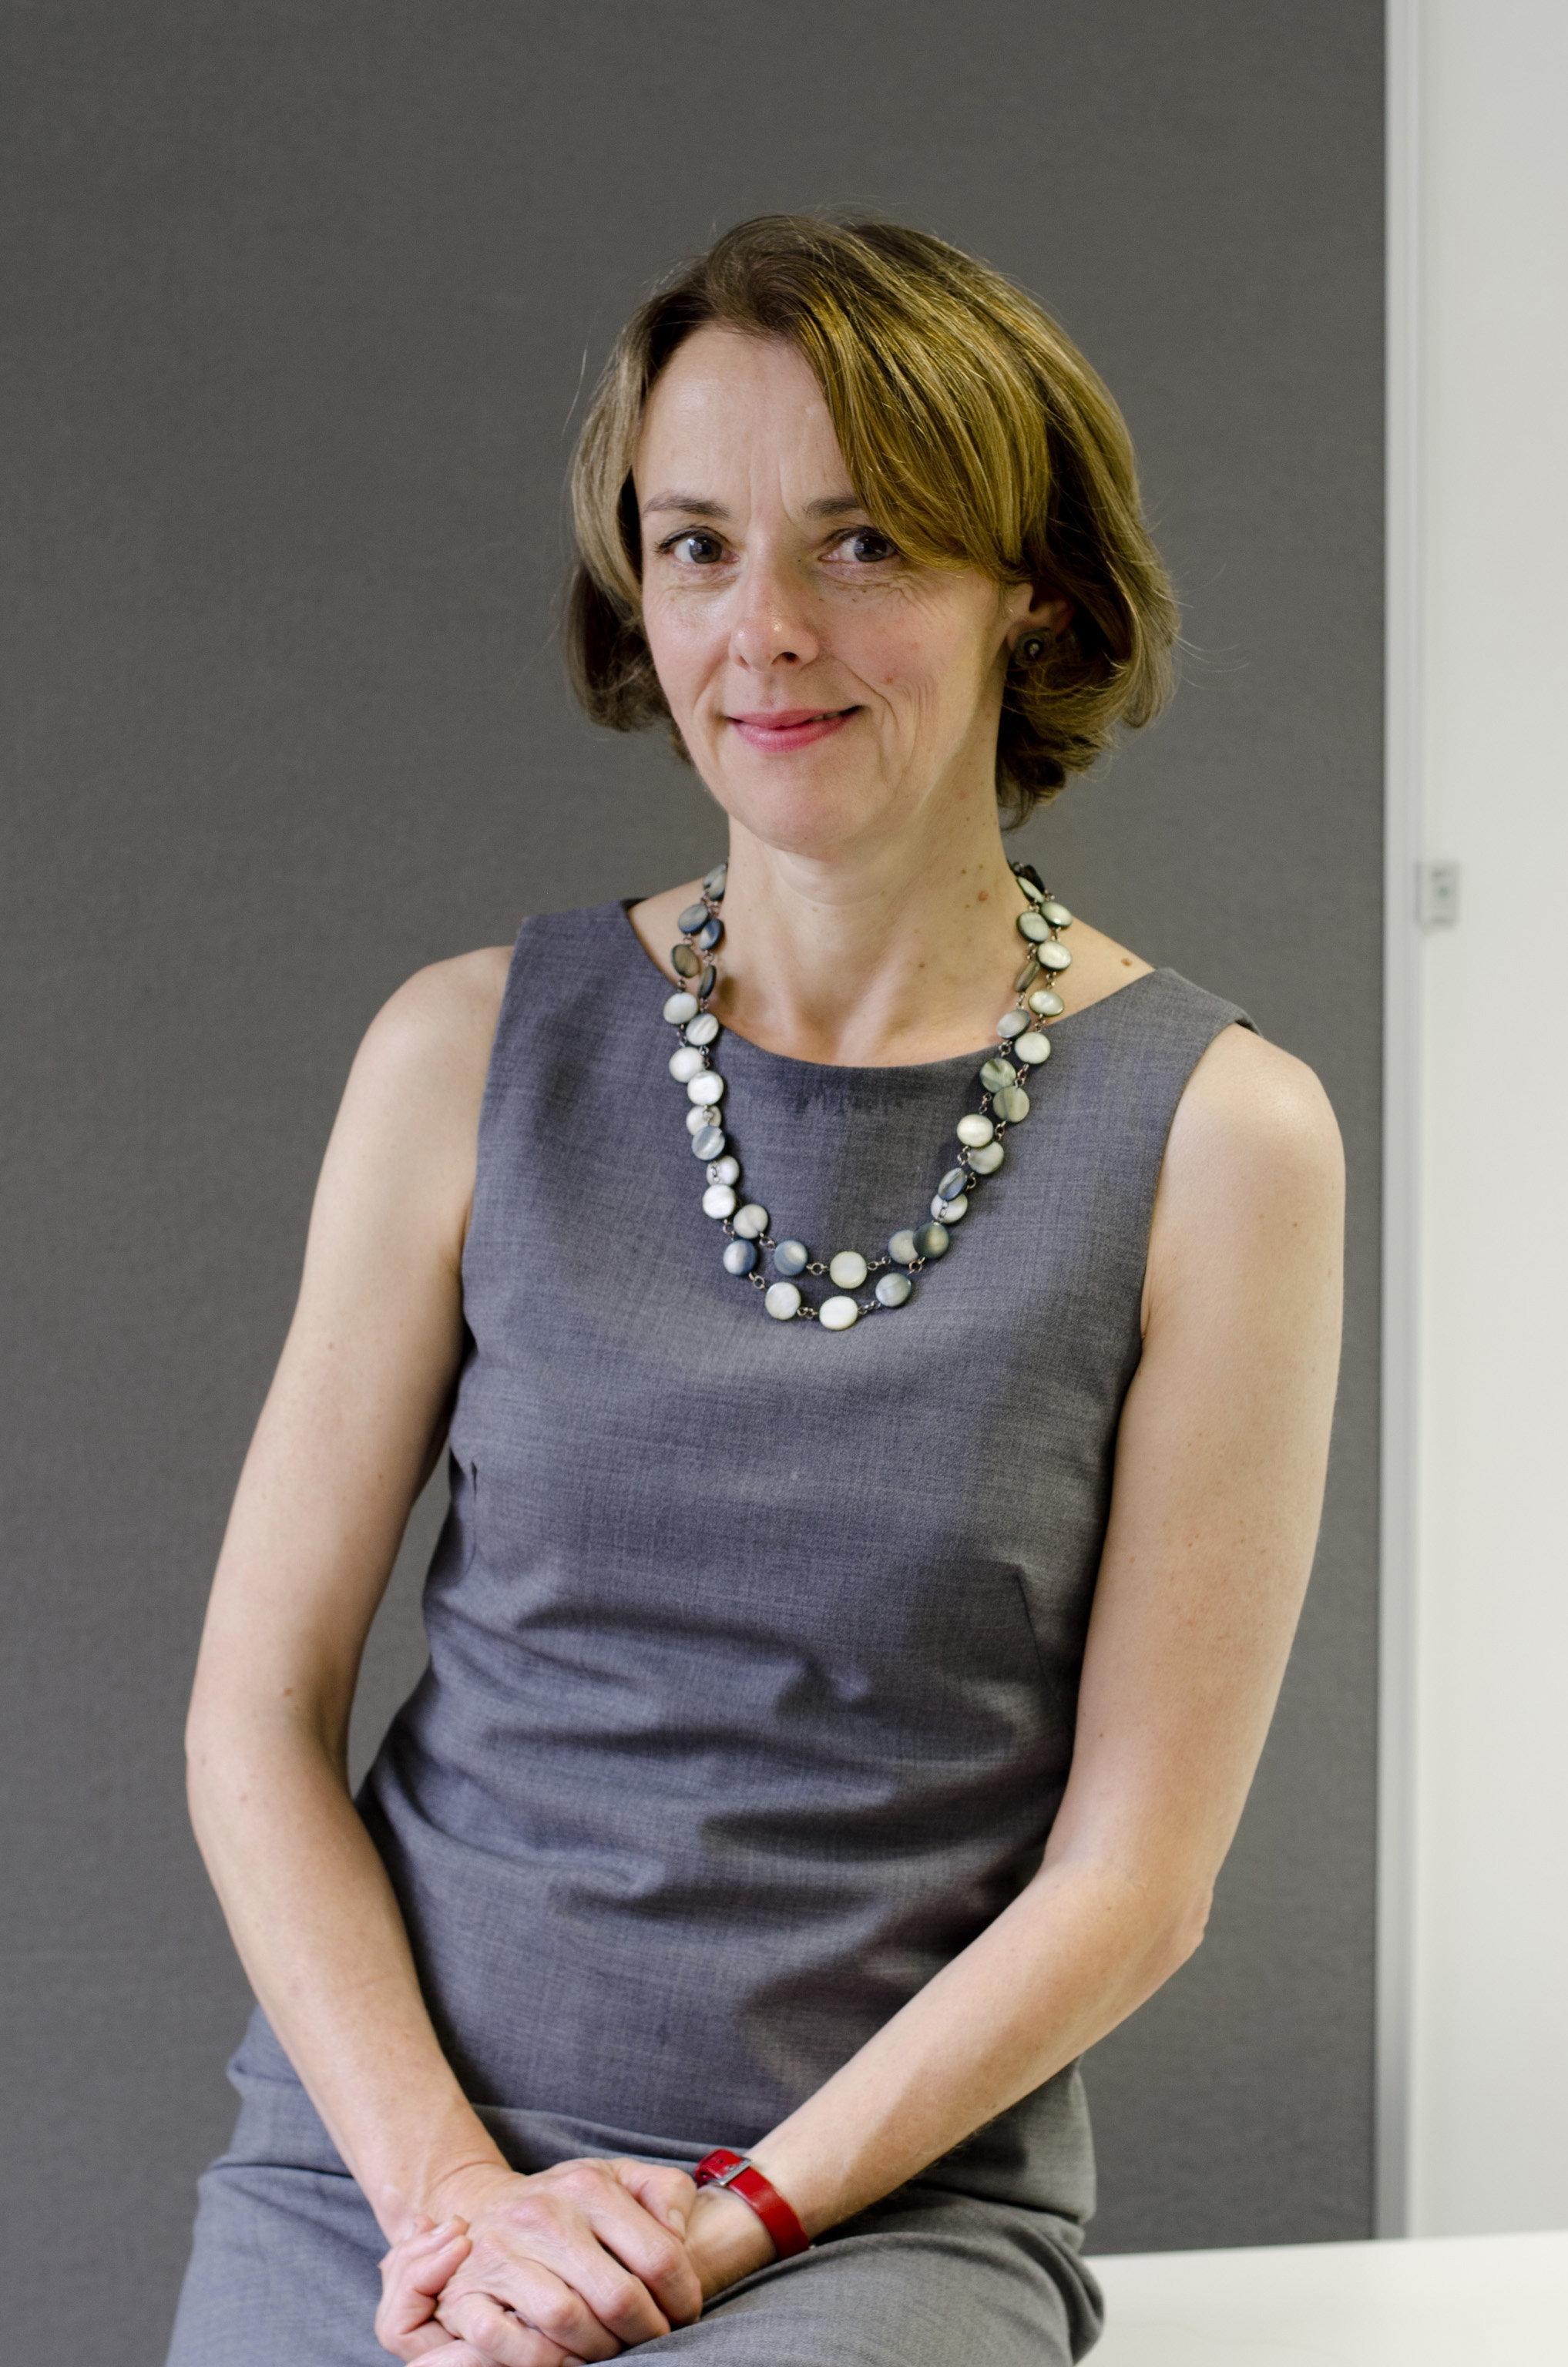 Lucy Kellaway